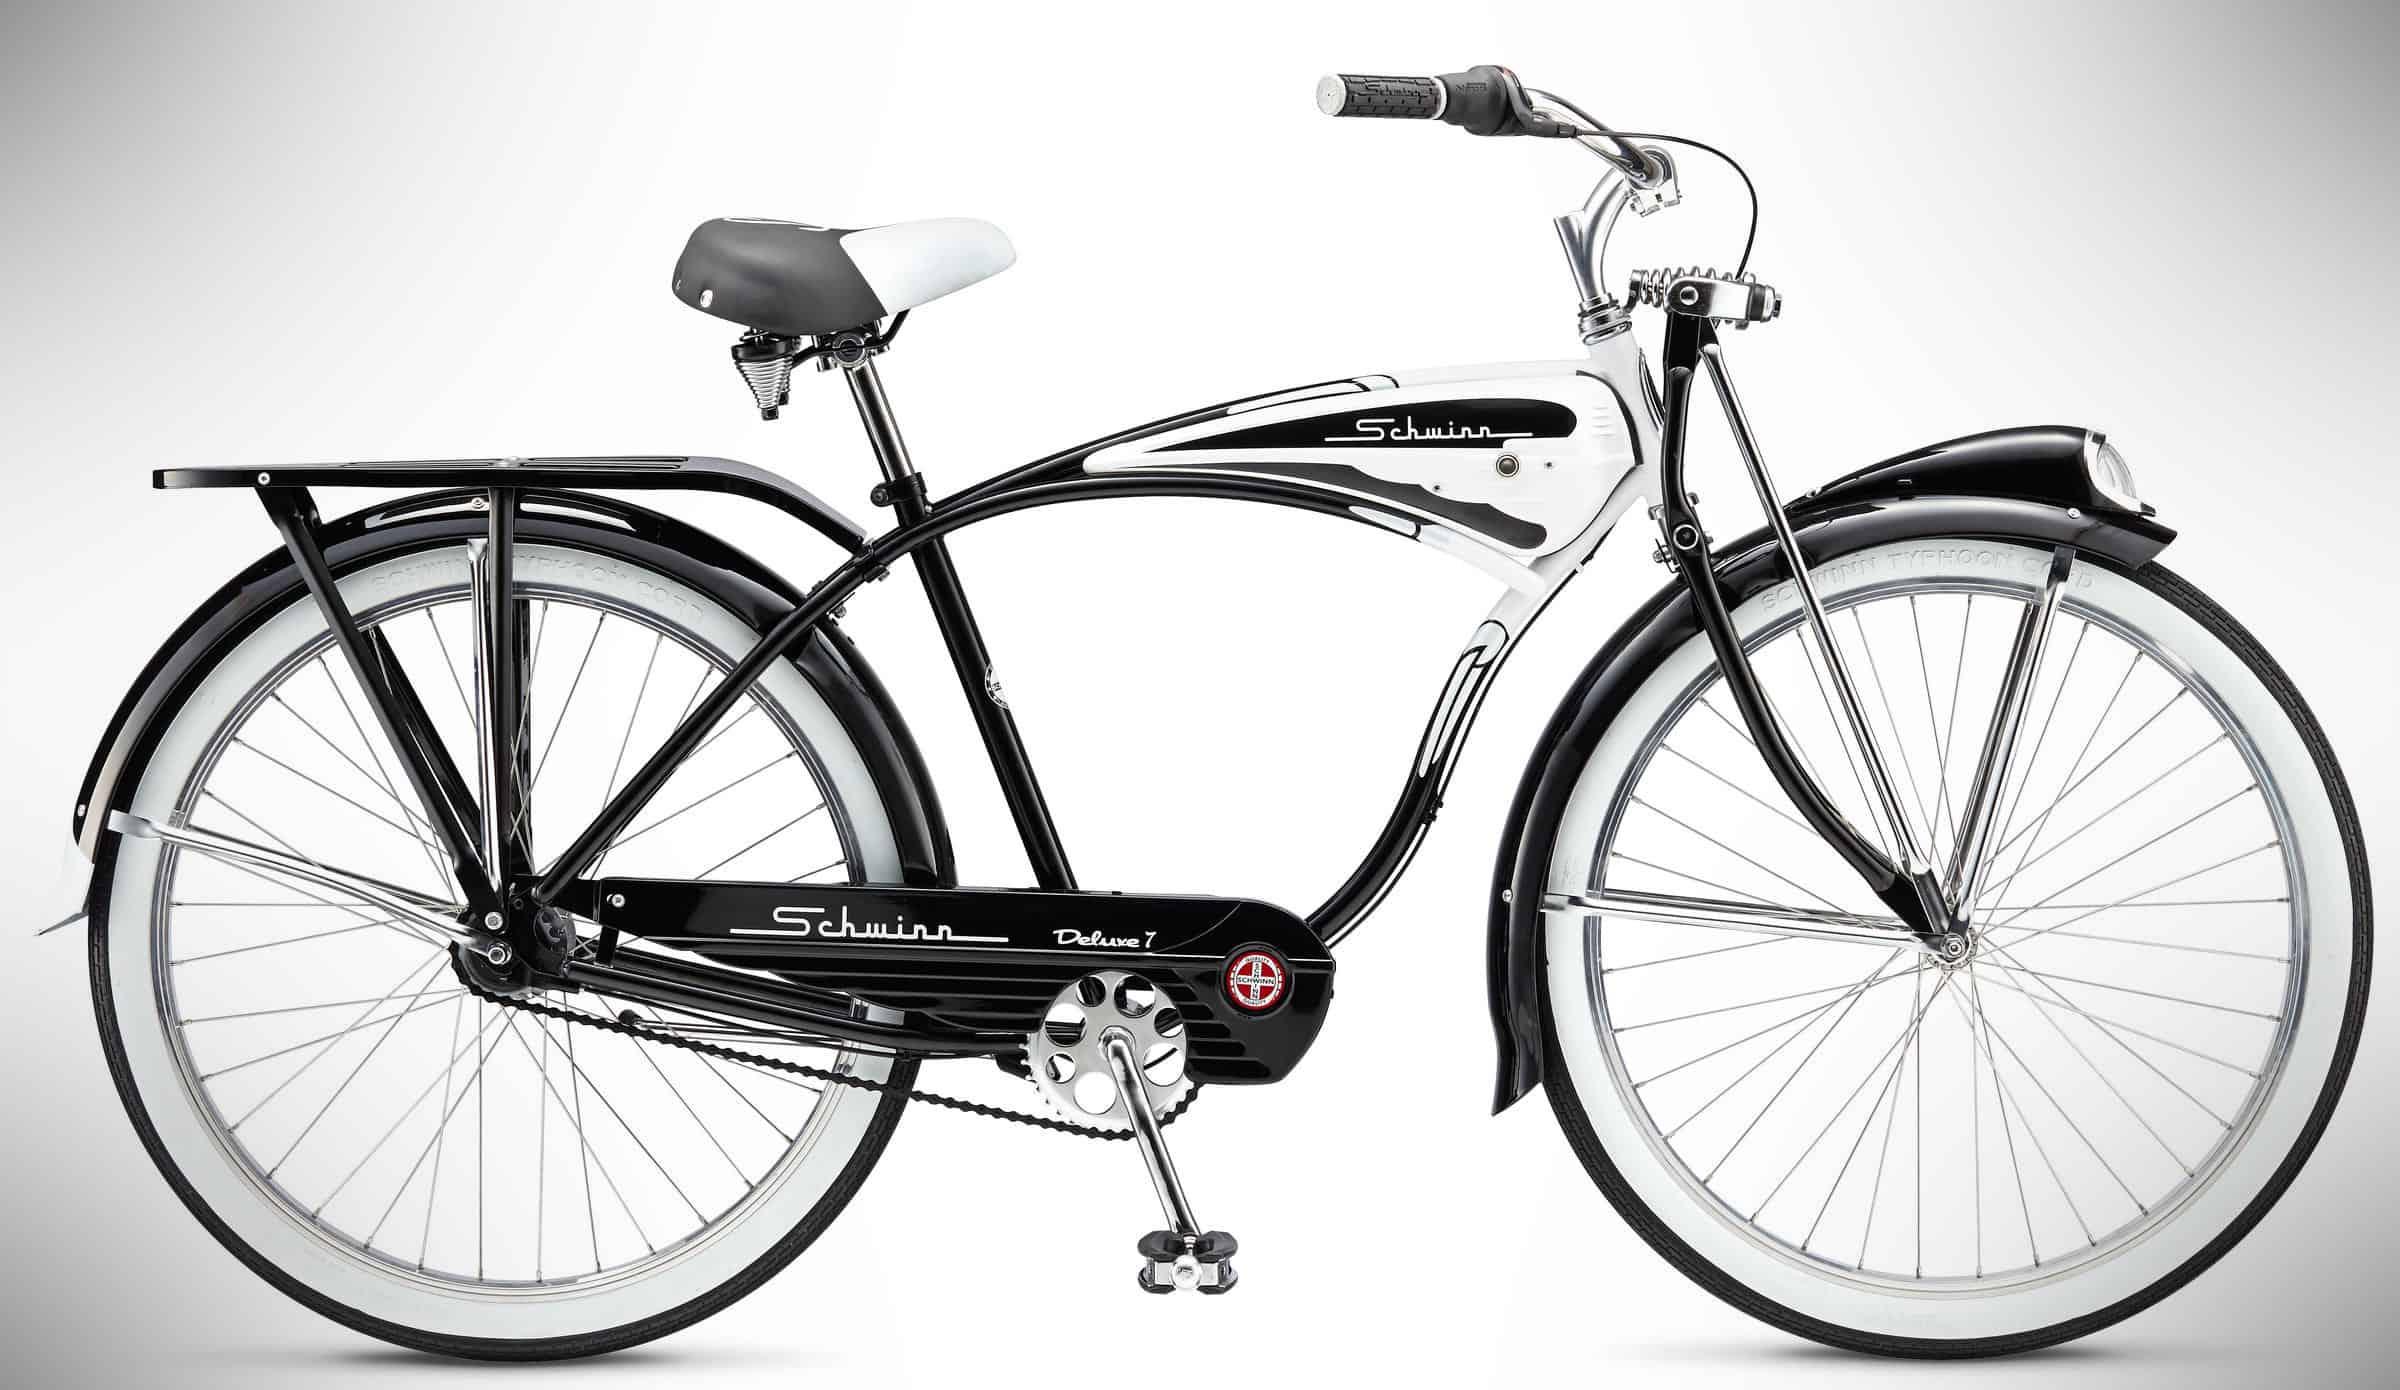 Schwinn Classic Deluxe 7 – cruiser bike